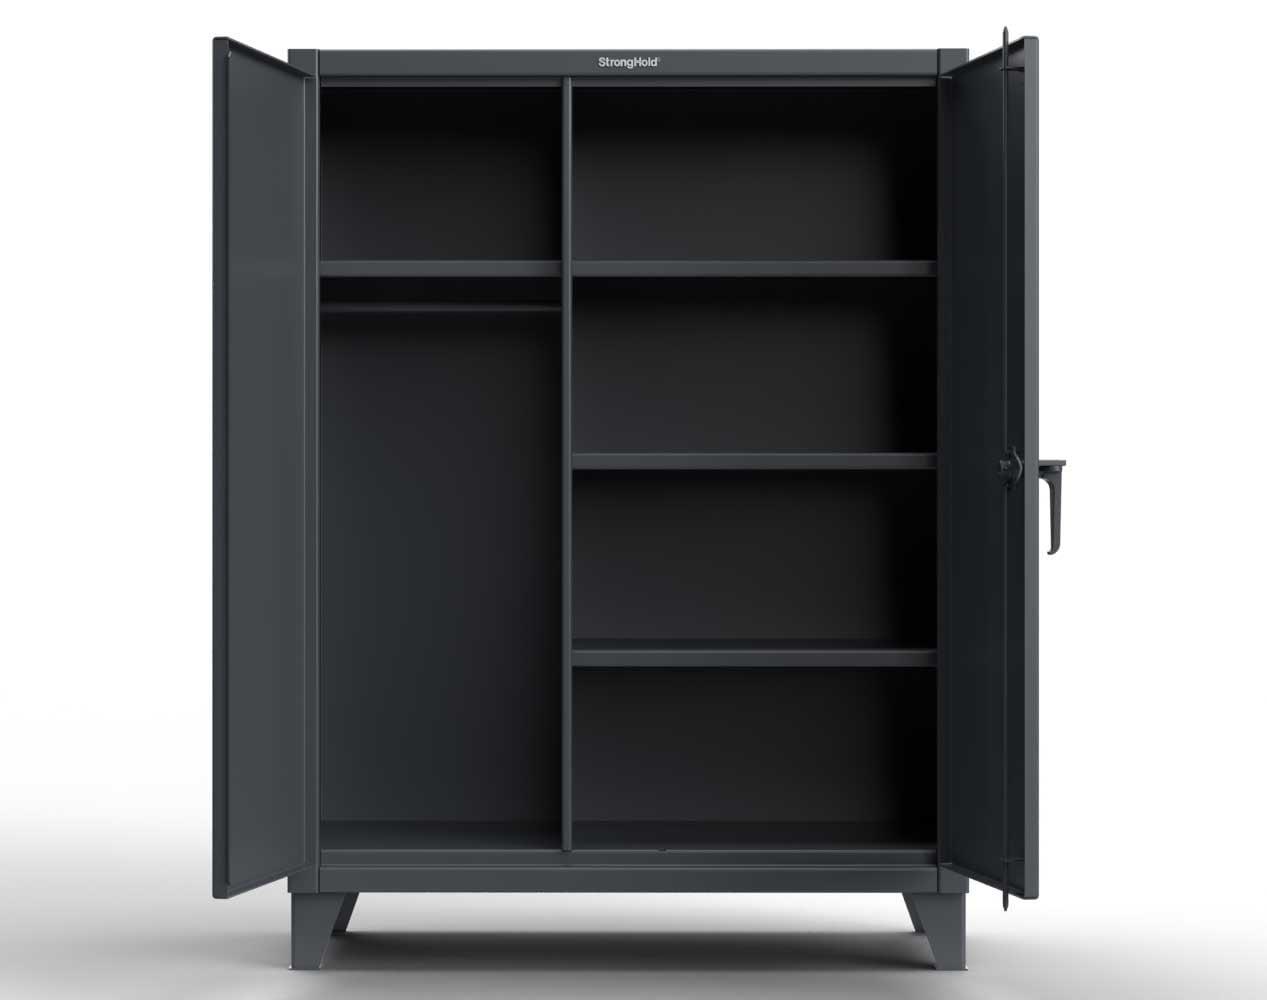 Extra Heavy Duty 12 GA Wardrobe Cabinet with 4 Shelves – 60 In. W x 24 In. D x 66 In. H